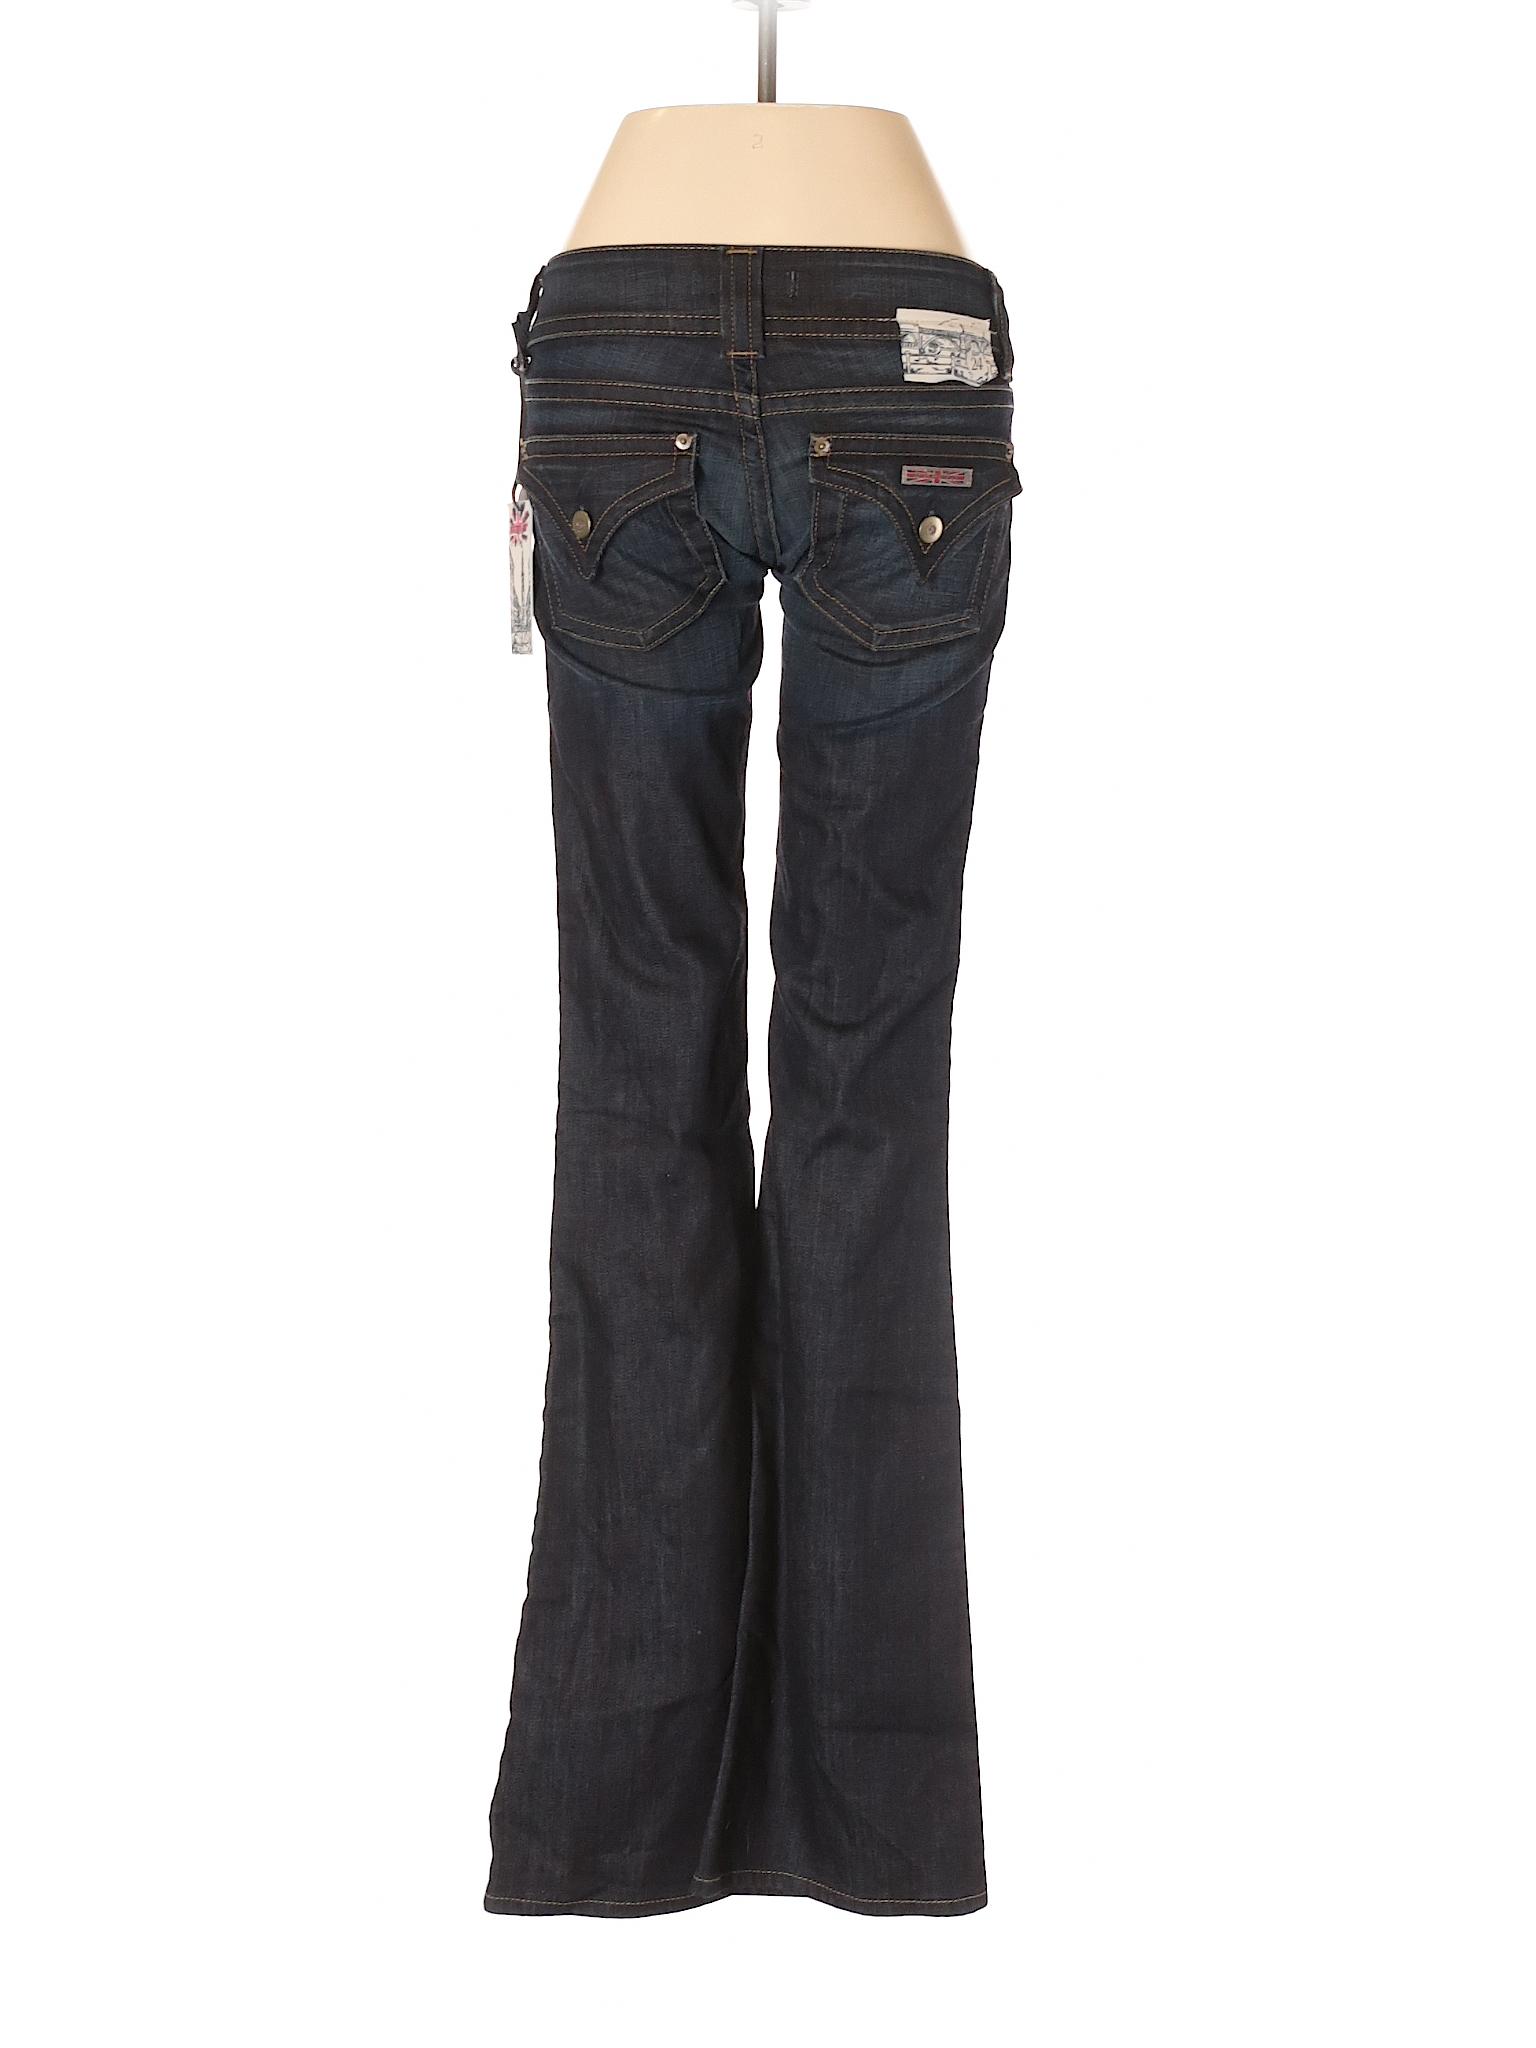 Promotion Hudson Promotion Hudson Jeans Jeans FqEYB